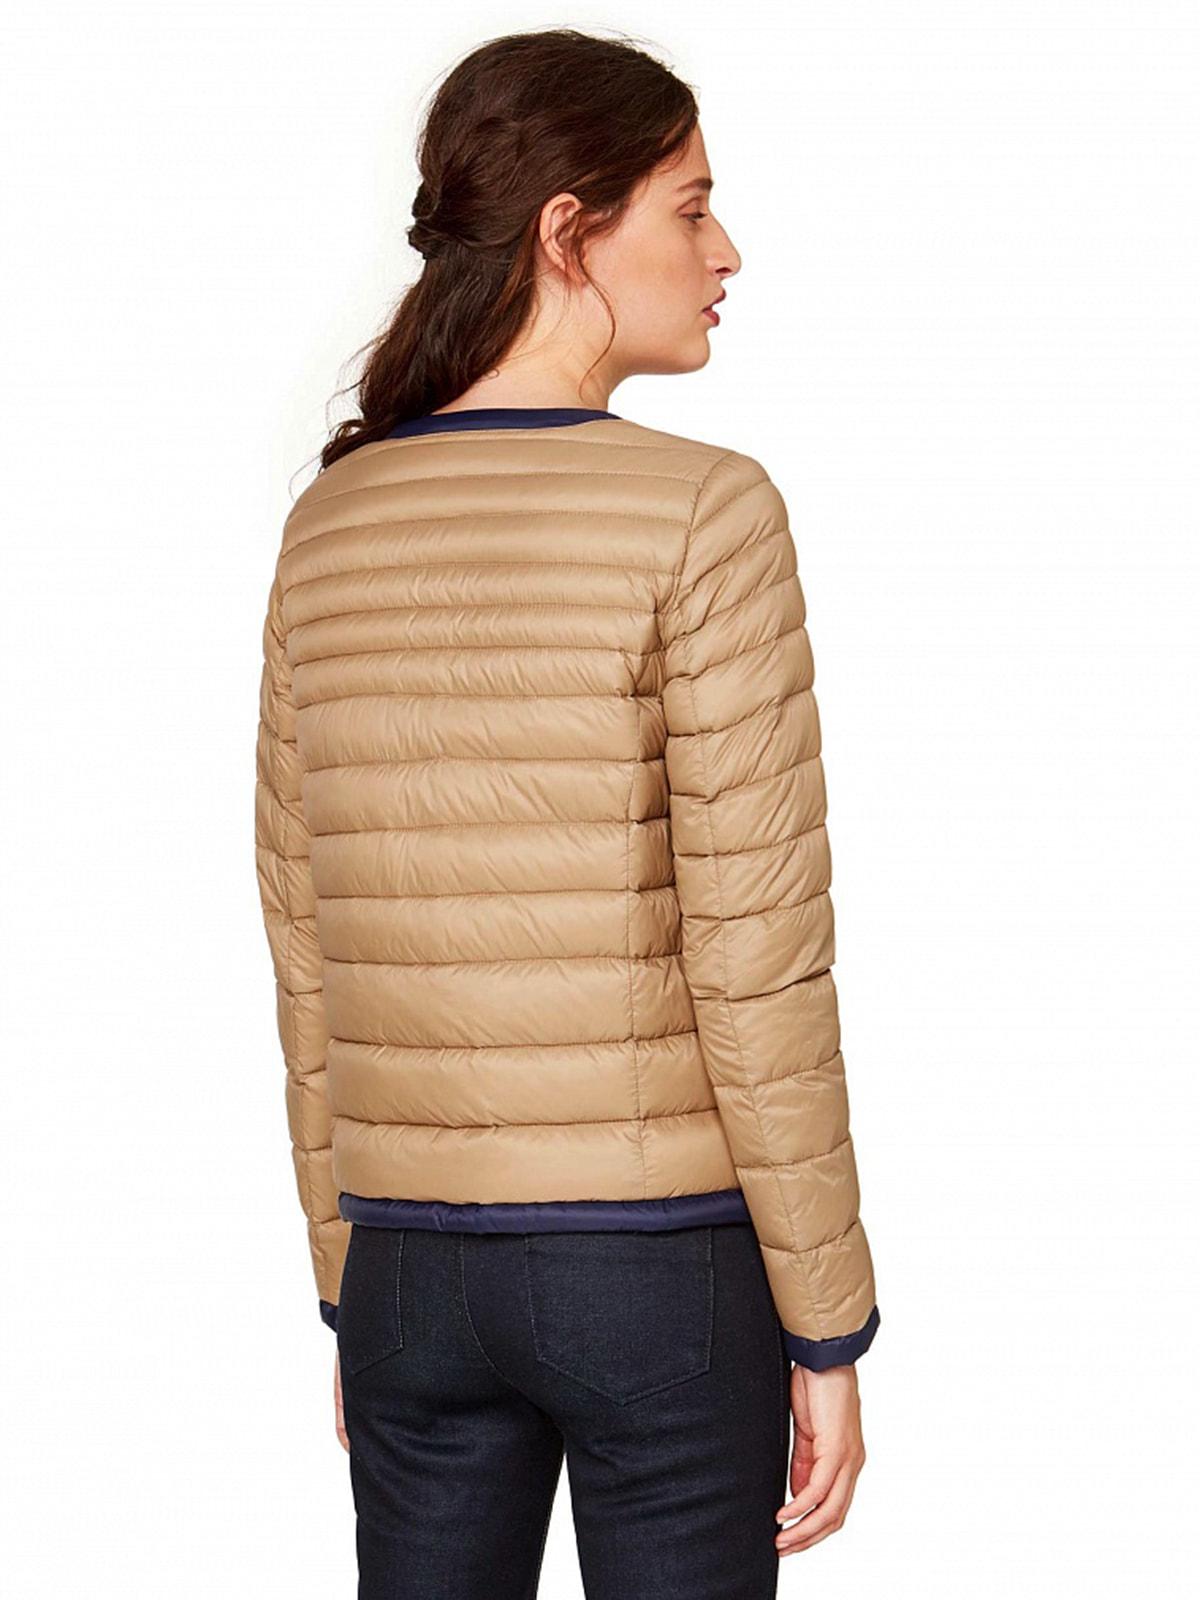 Куртка бежевая | 3556438 | фото 12